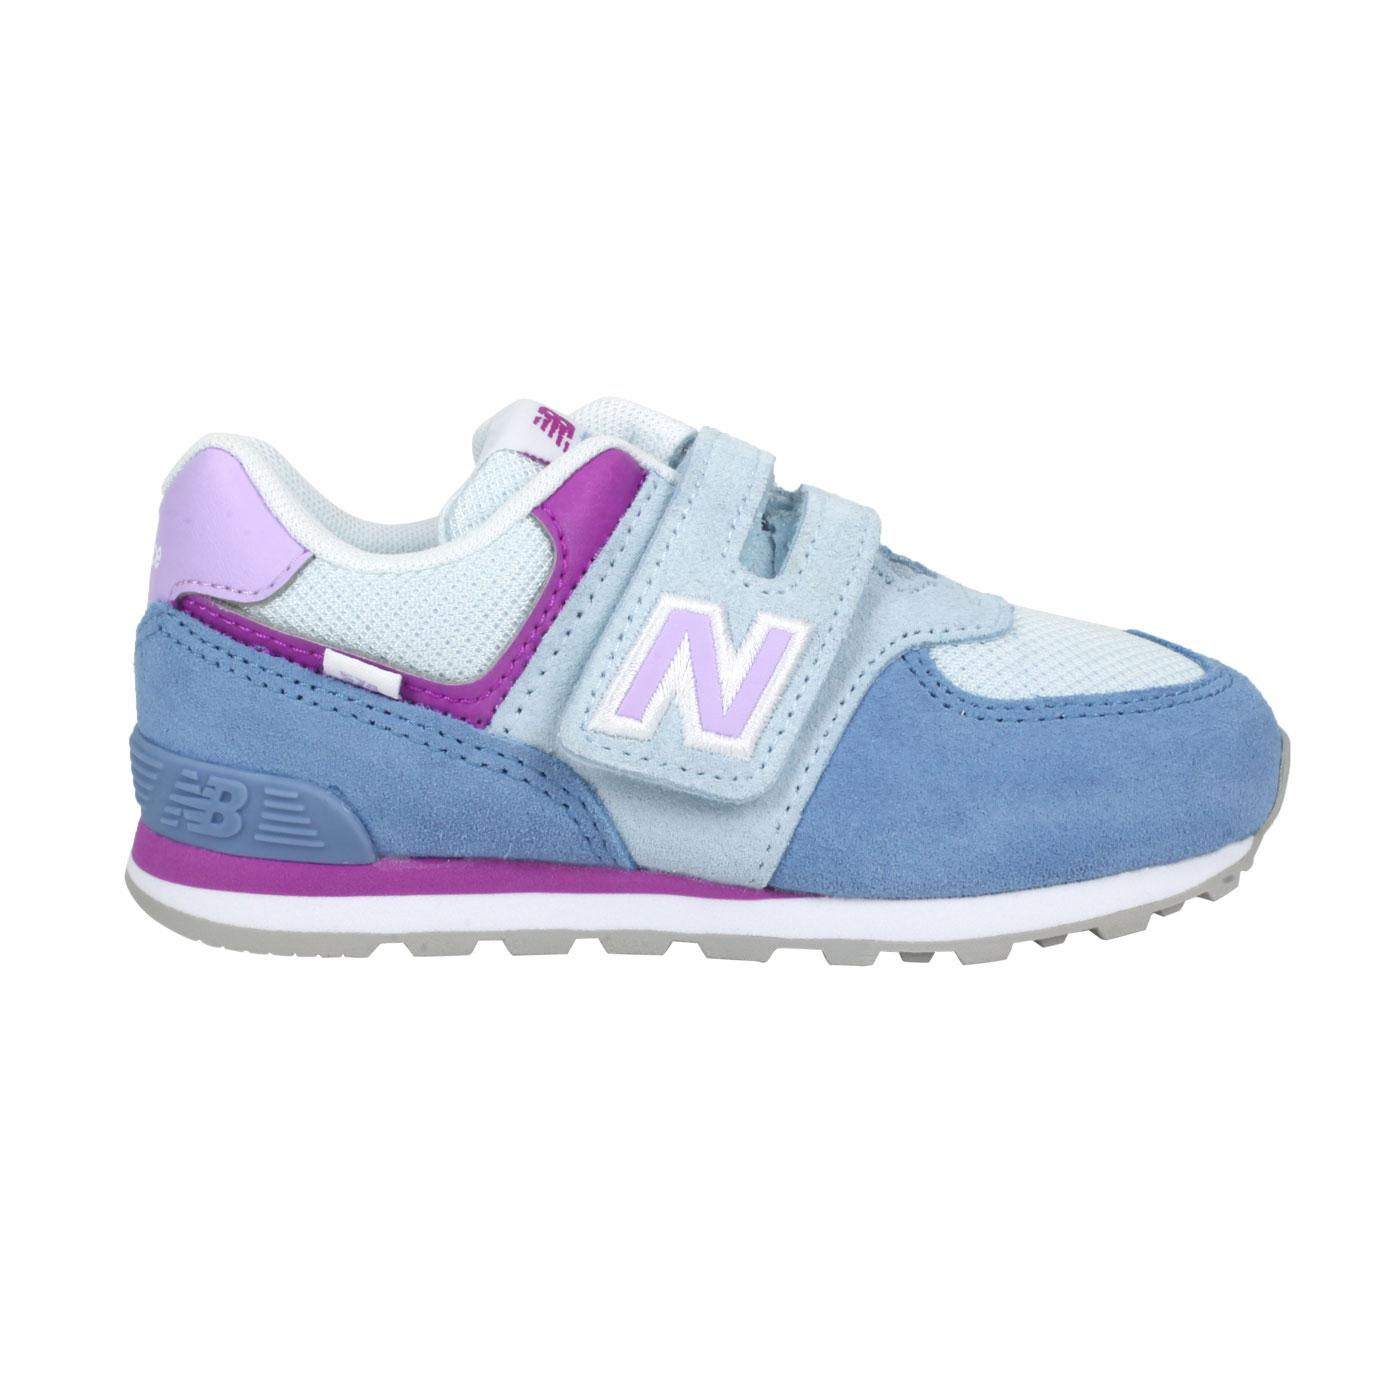 NEW BALANCE 小童休閒運動鞋-WIDE IV574SL2 - 藍紫白